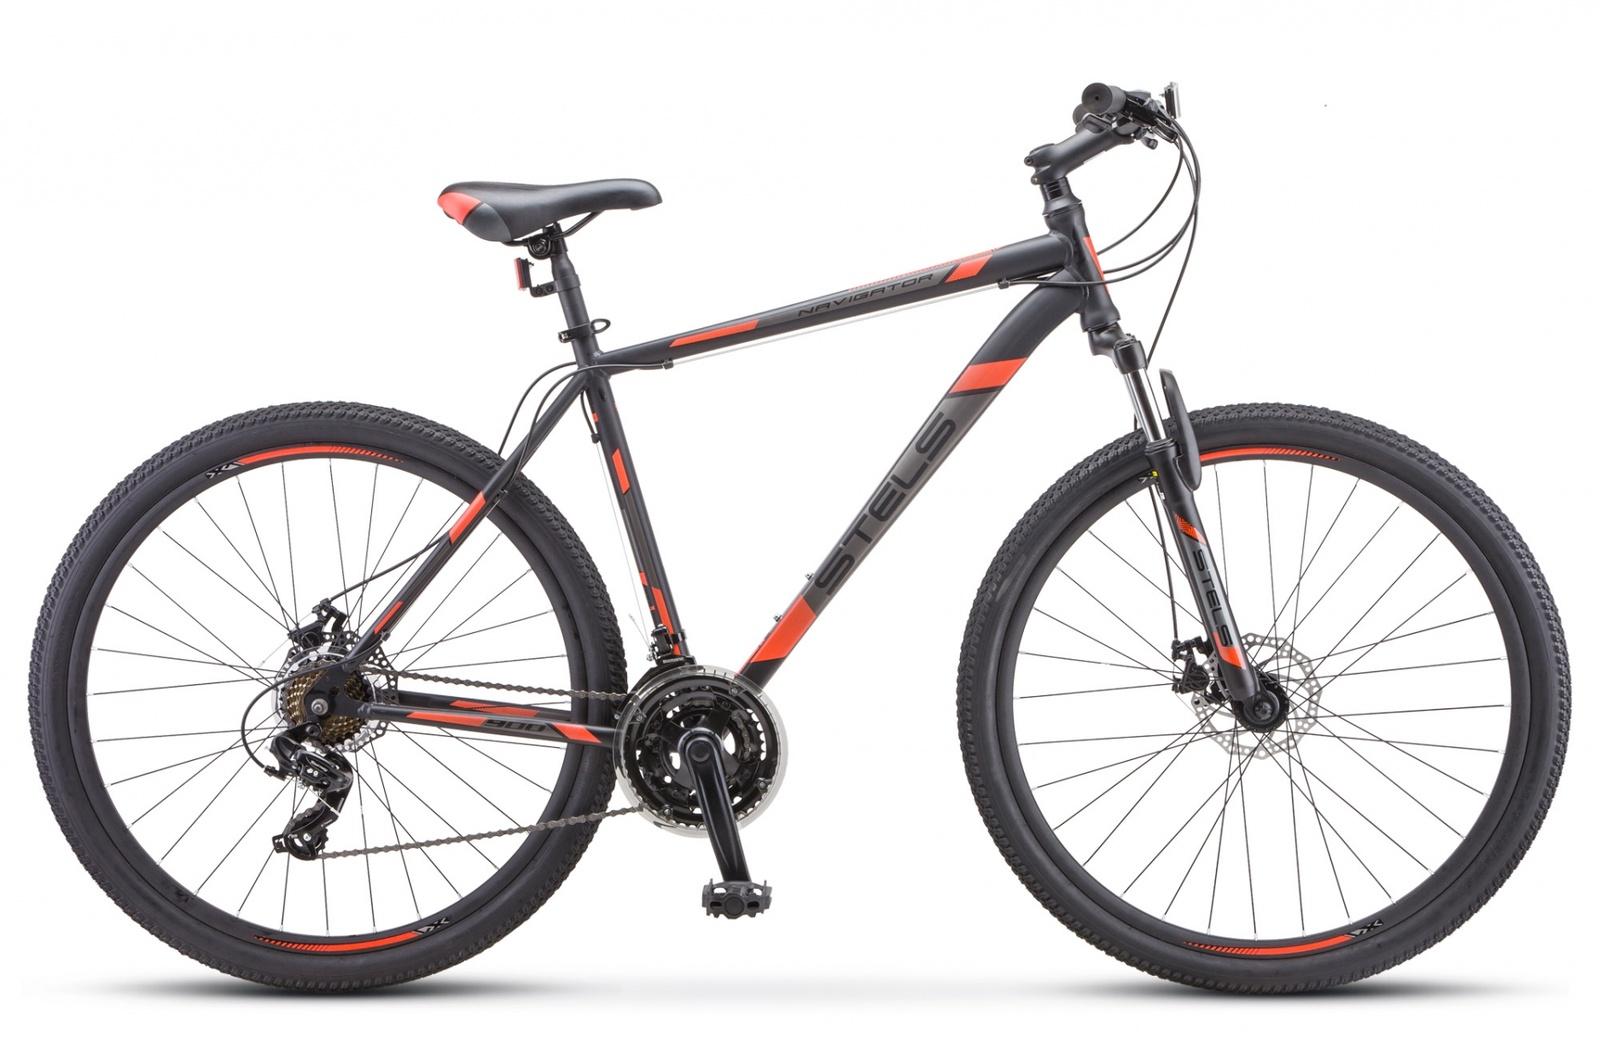 Велосипед Navigator 900 MD 29 F010 (2019), рама 17,5 дюйм